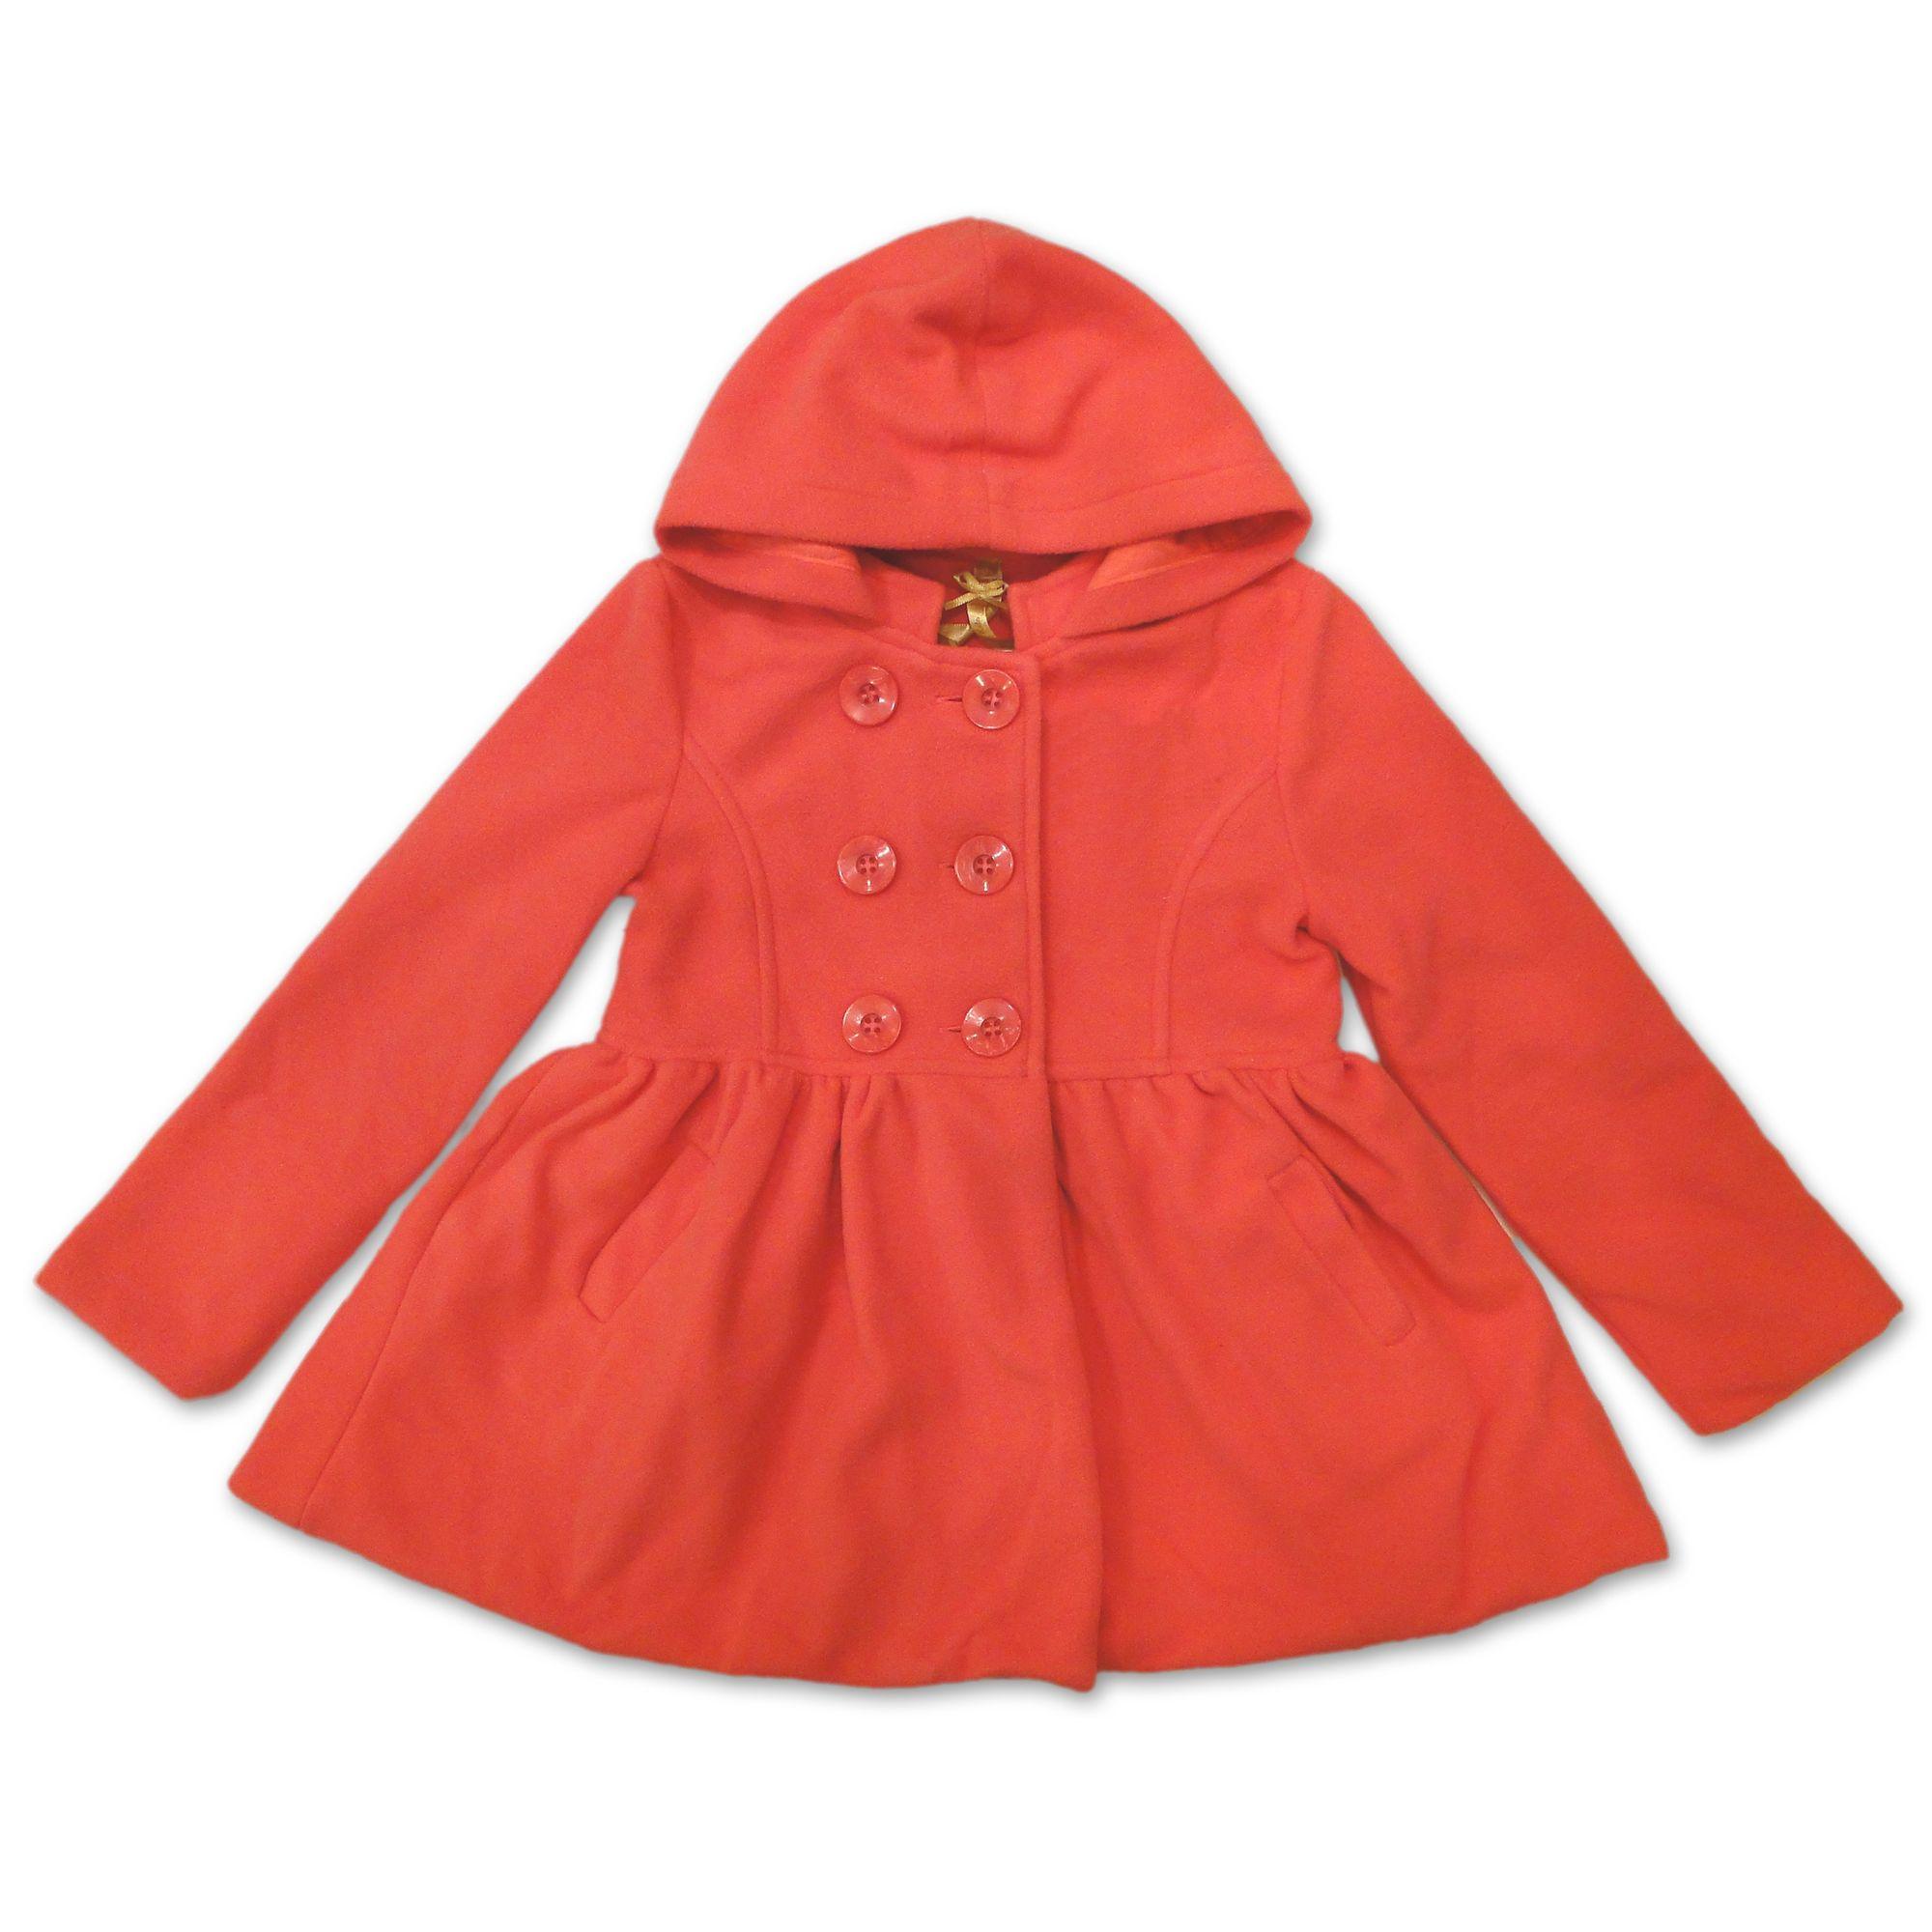 casaco-infantil-soft-coral-meninas-gira-baby